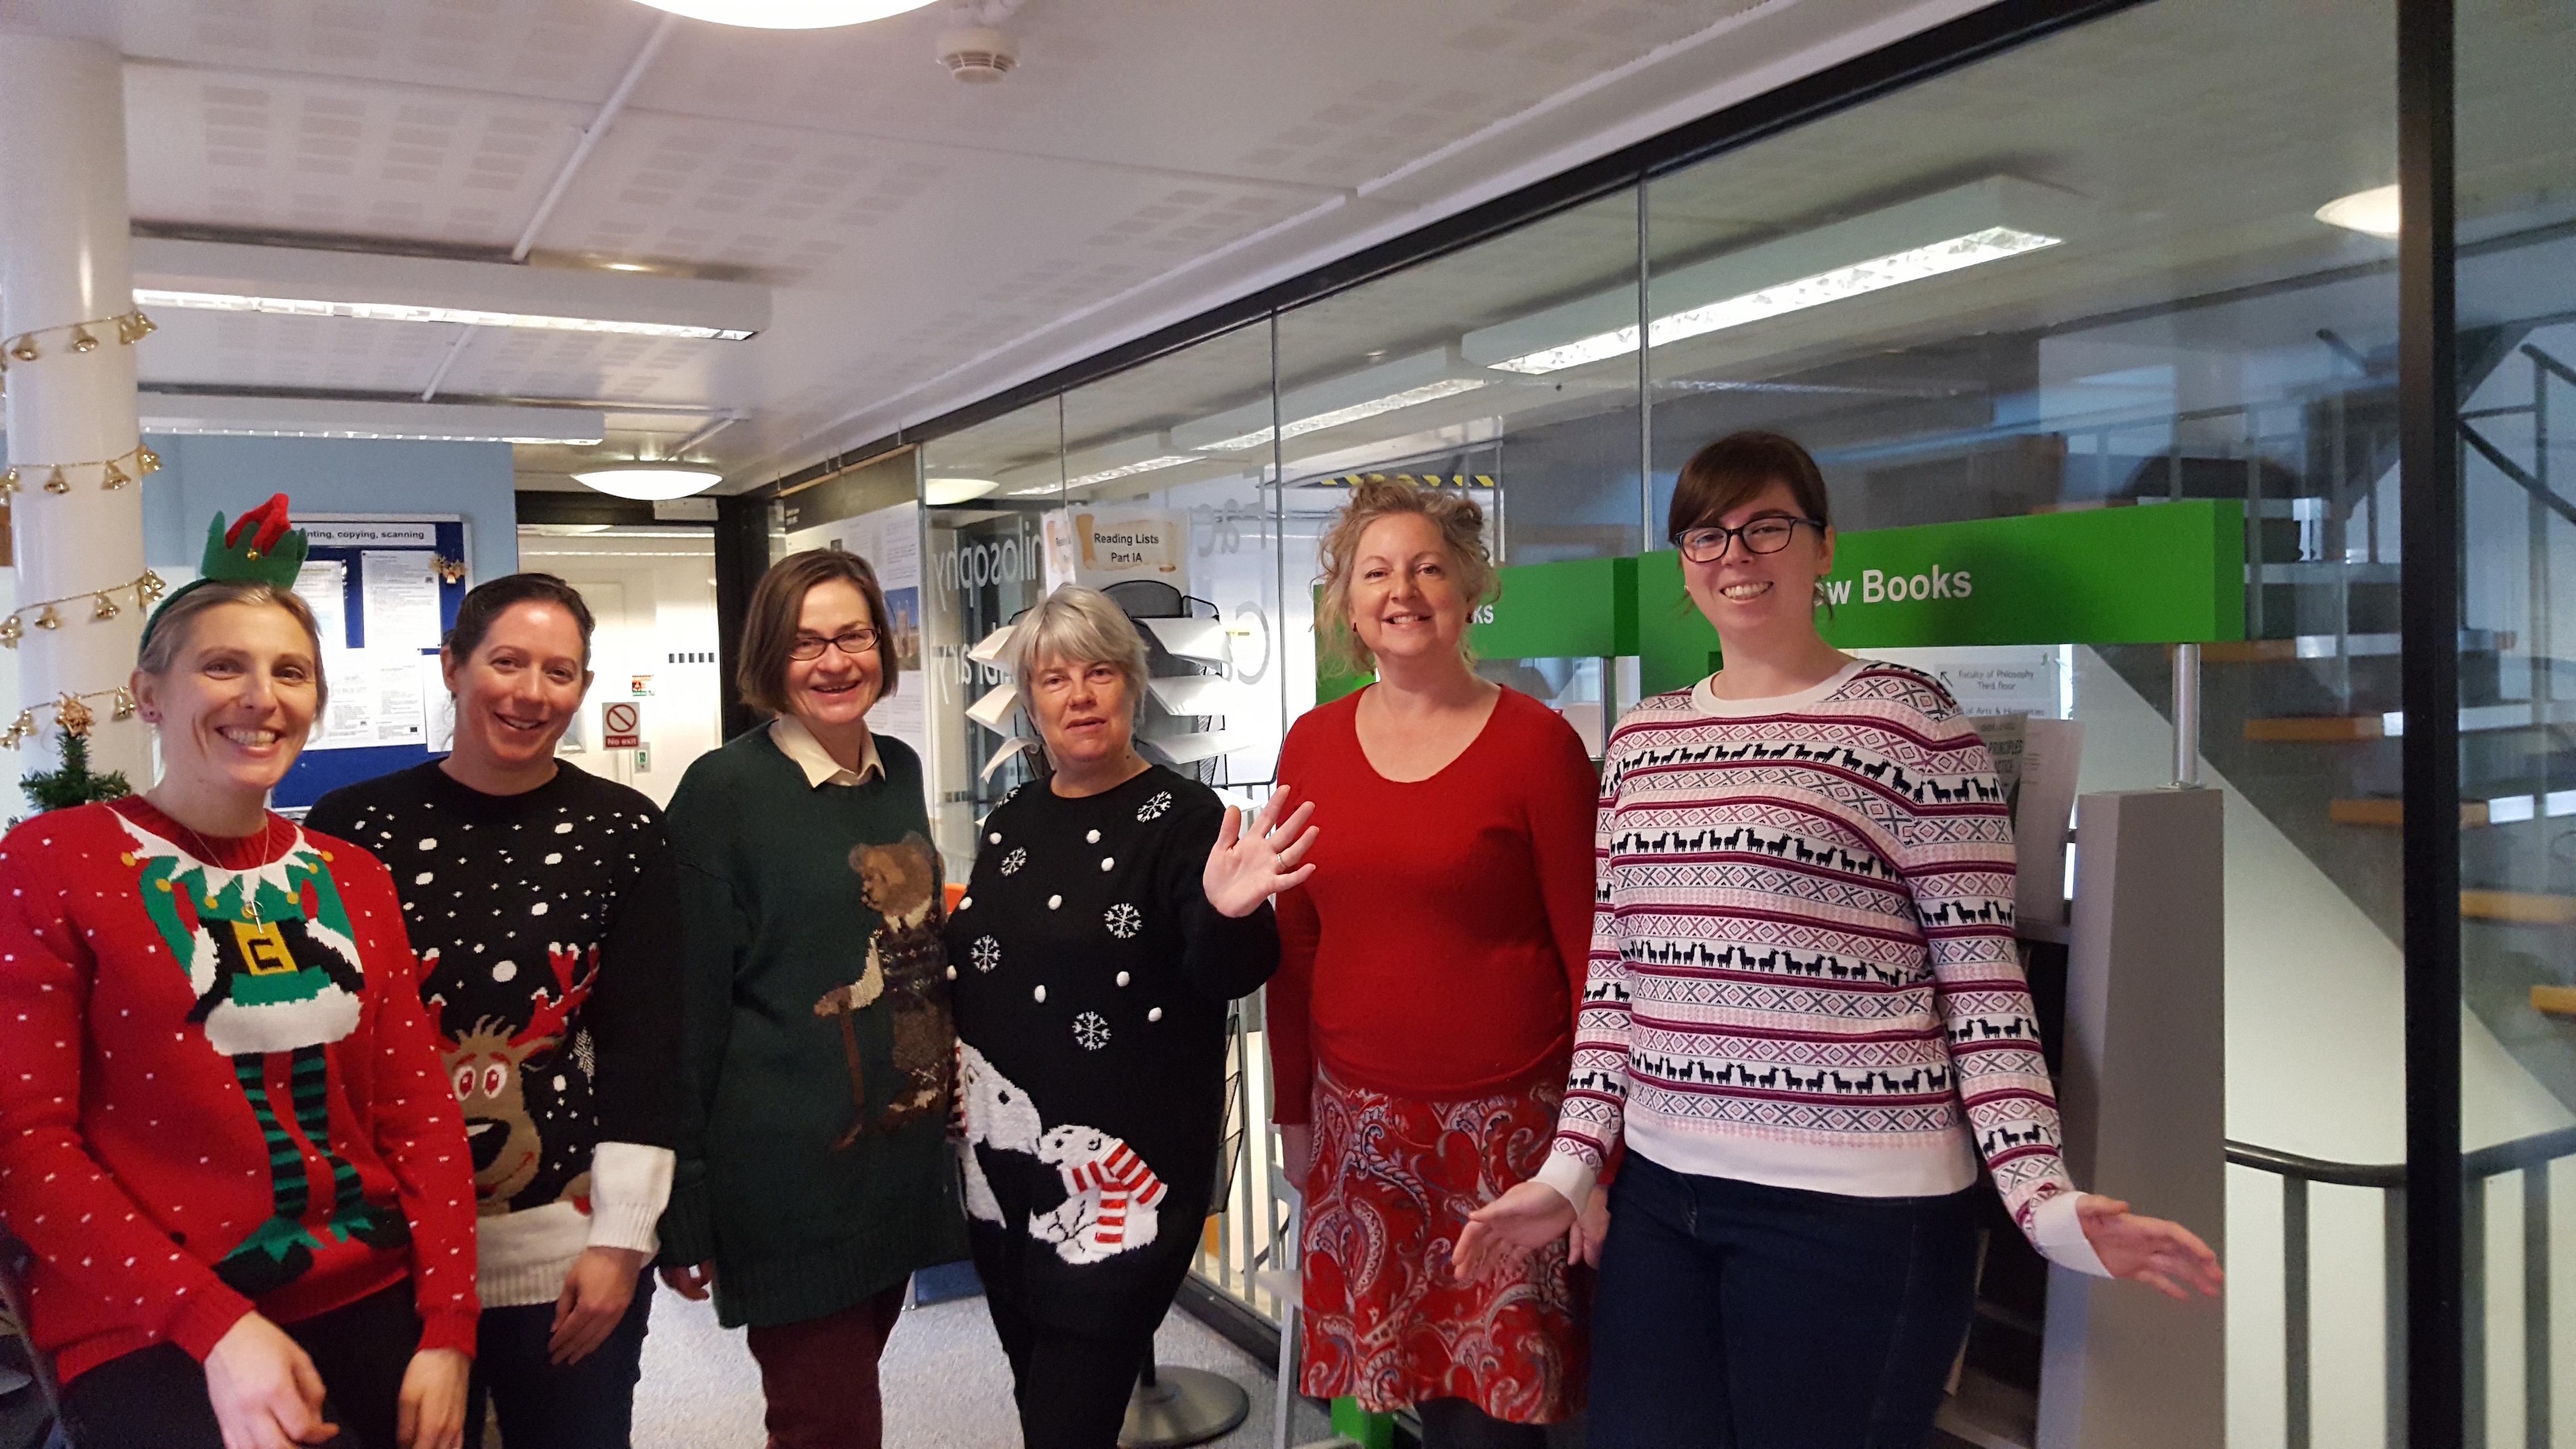 Staff wearing warm jumpers